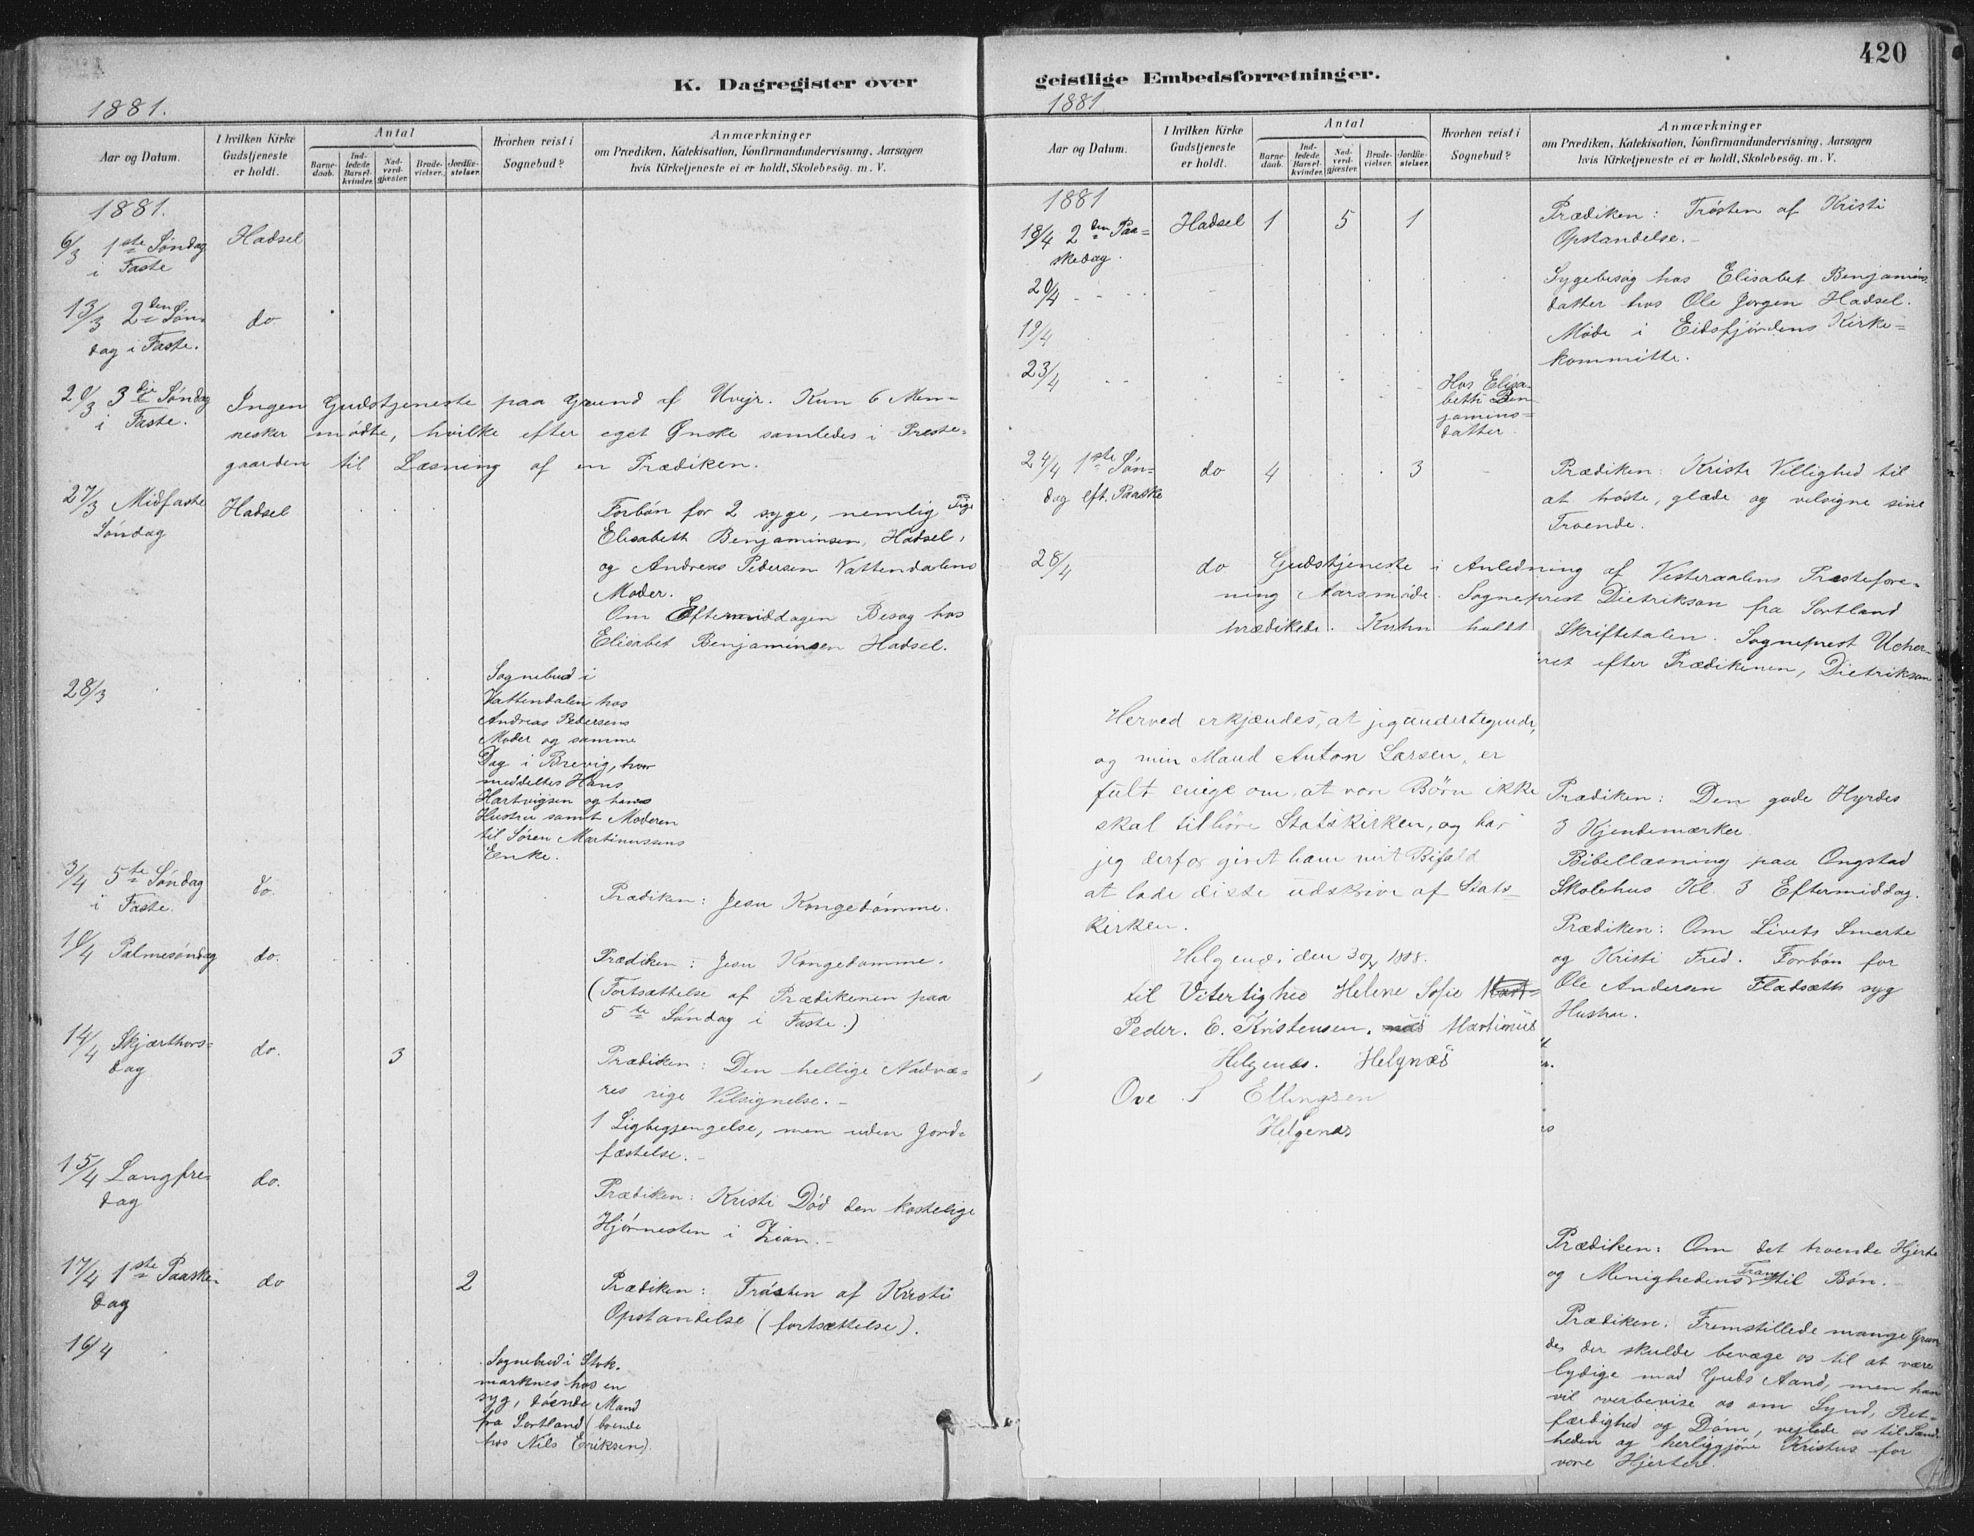 SAT, Ministerialprotokoller, klokkerbøker og fødselsregistre - Nordland, 888/L1244: Ministerialbok nr. 888A10, 1880-1890, s. 420